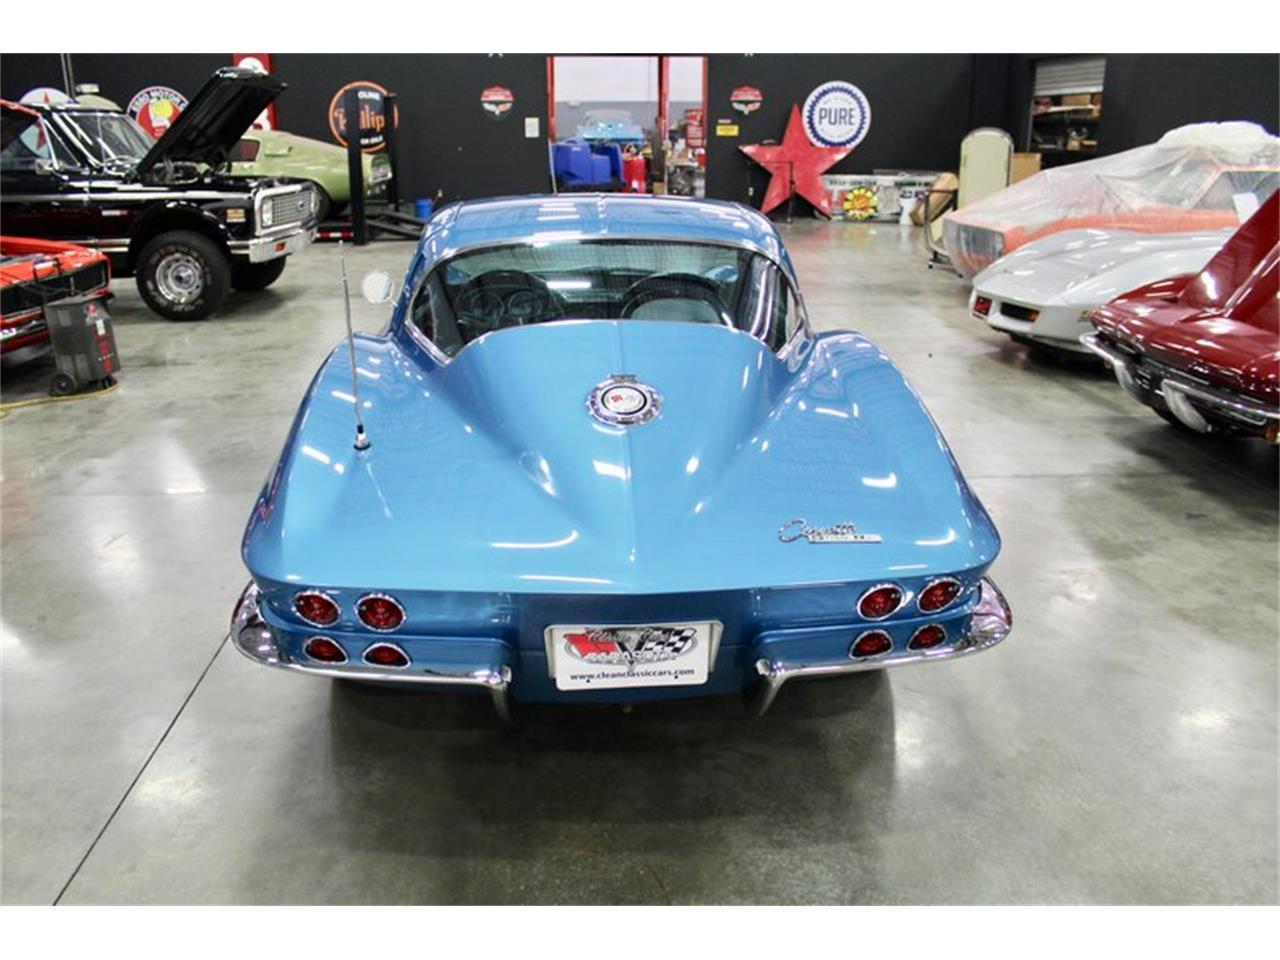 Large Picture of Classic 1965 Corvette located in Sarasota Florida - $69,500.00 - QSRR